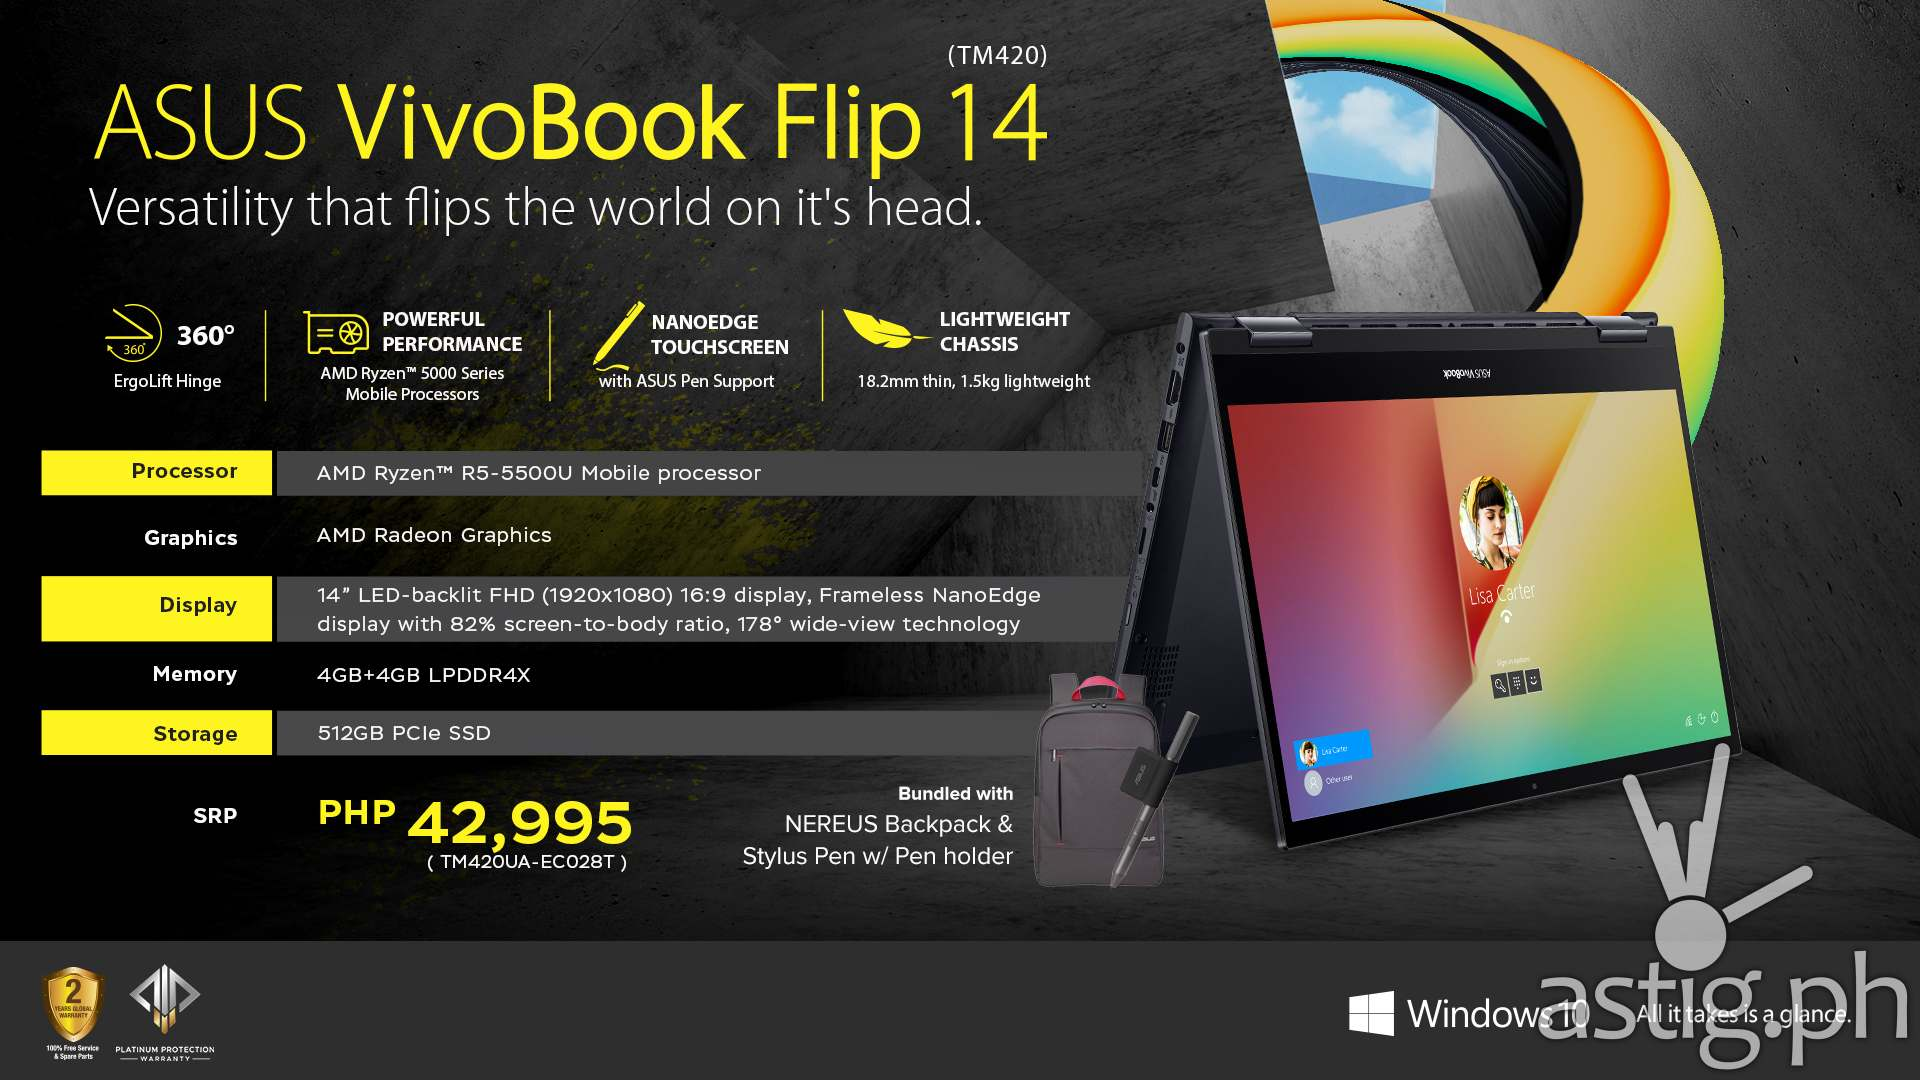 ASUS VivoBook Flip 14 TM420 Summary